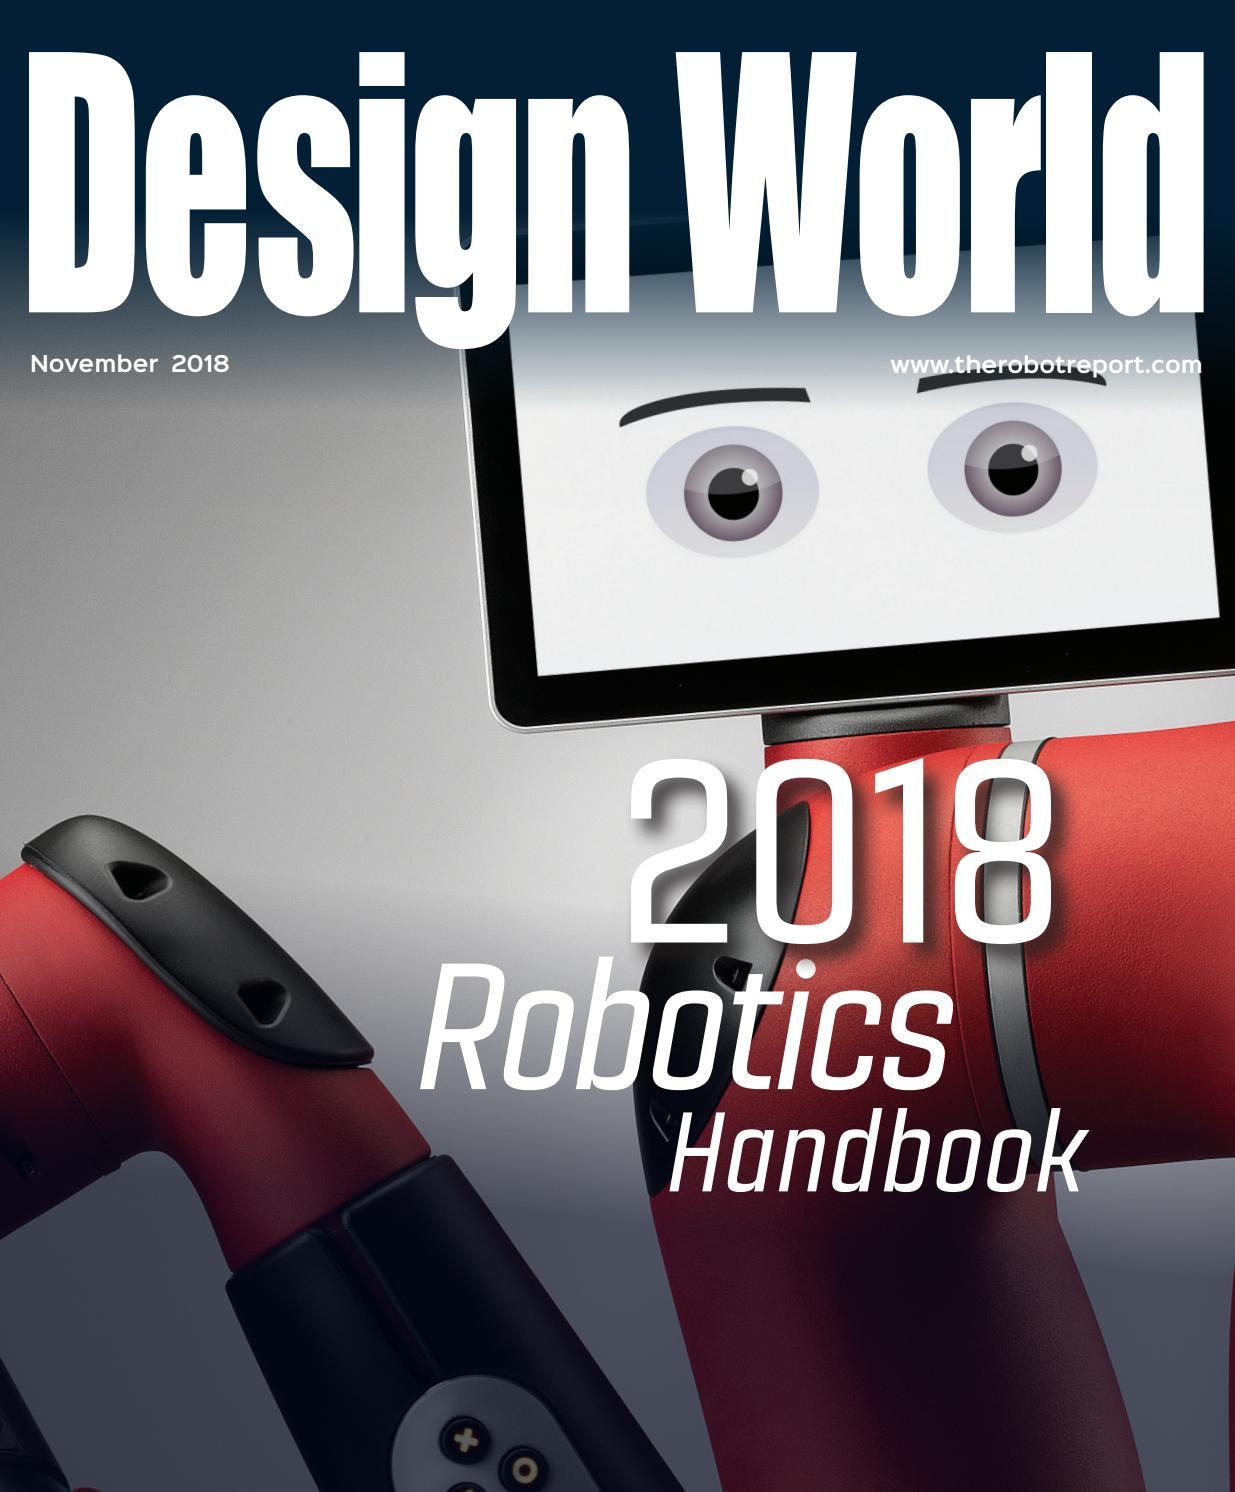 DESIGN WORLD ROBOTICS HANDBOOK 2018 by WTWH Media LLC - issuu